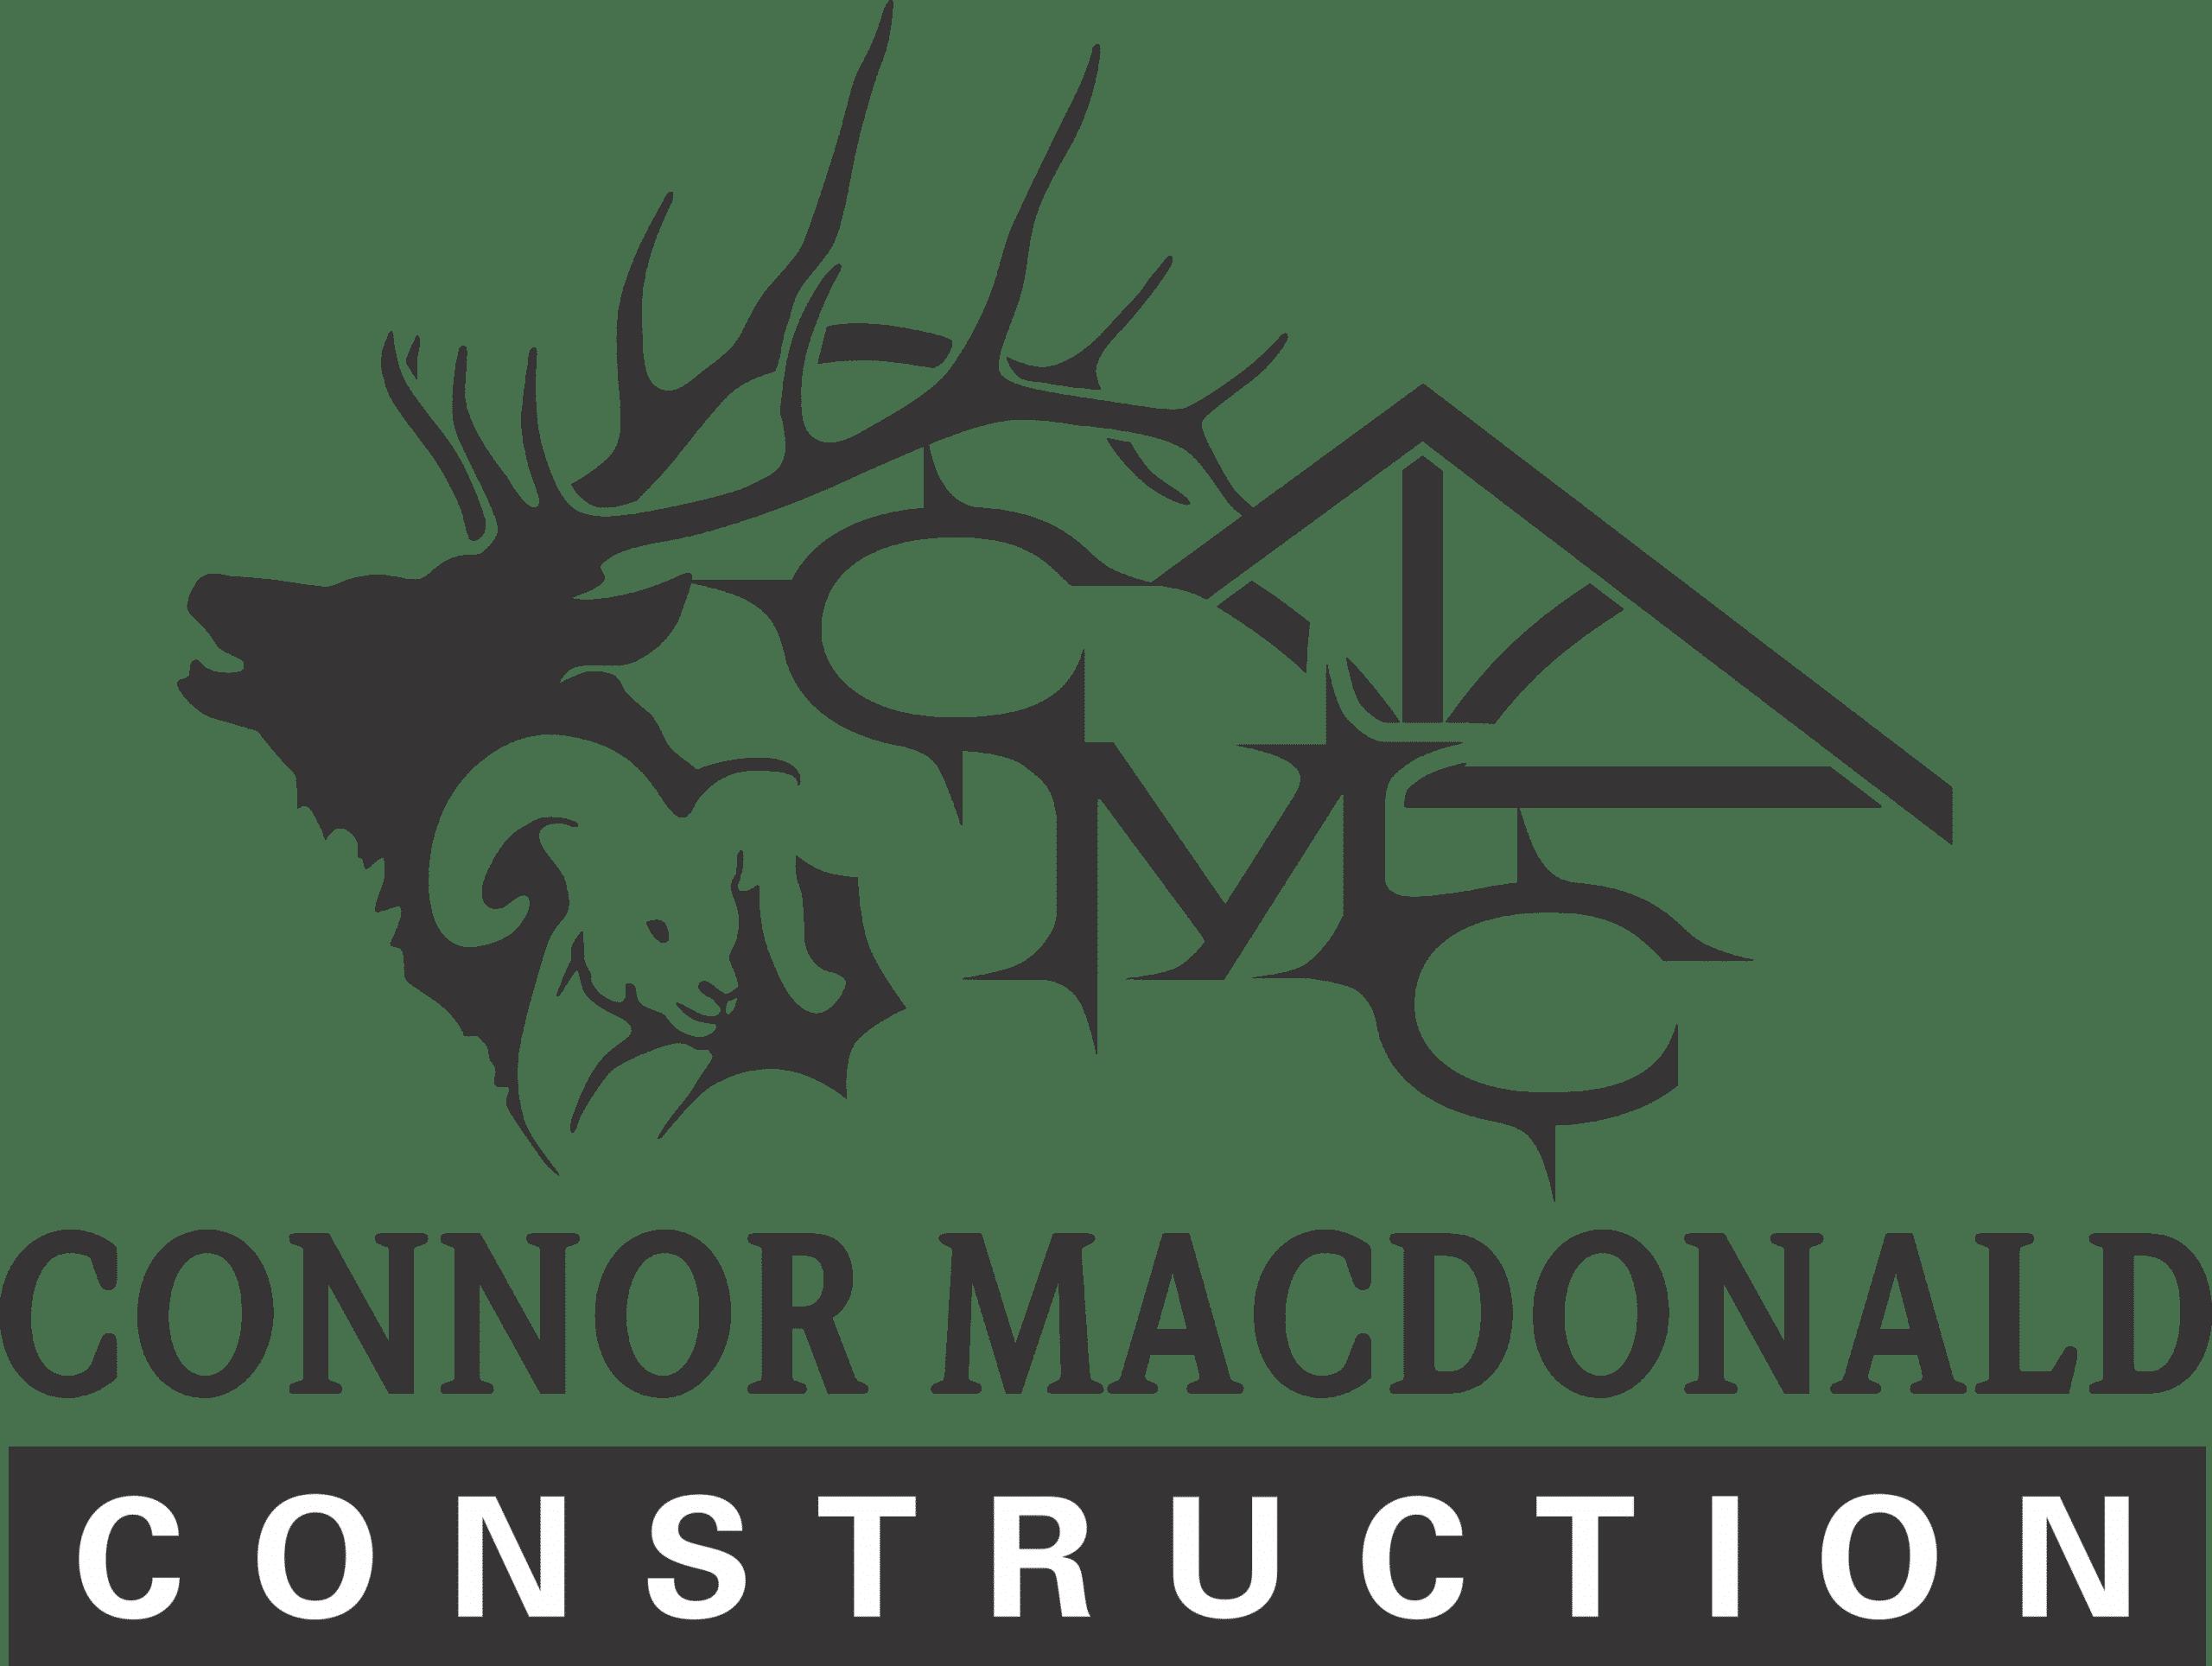 Connor MacDonald